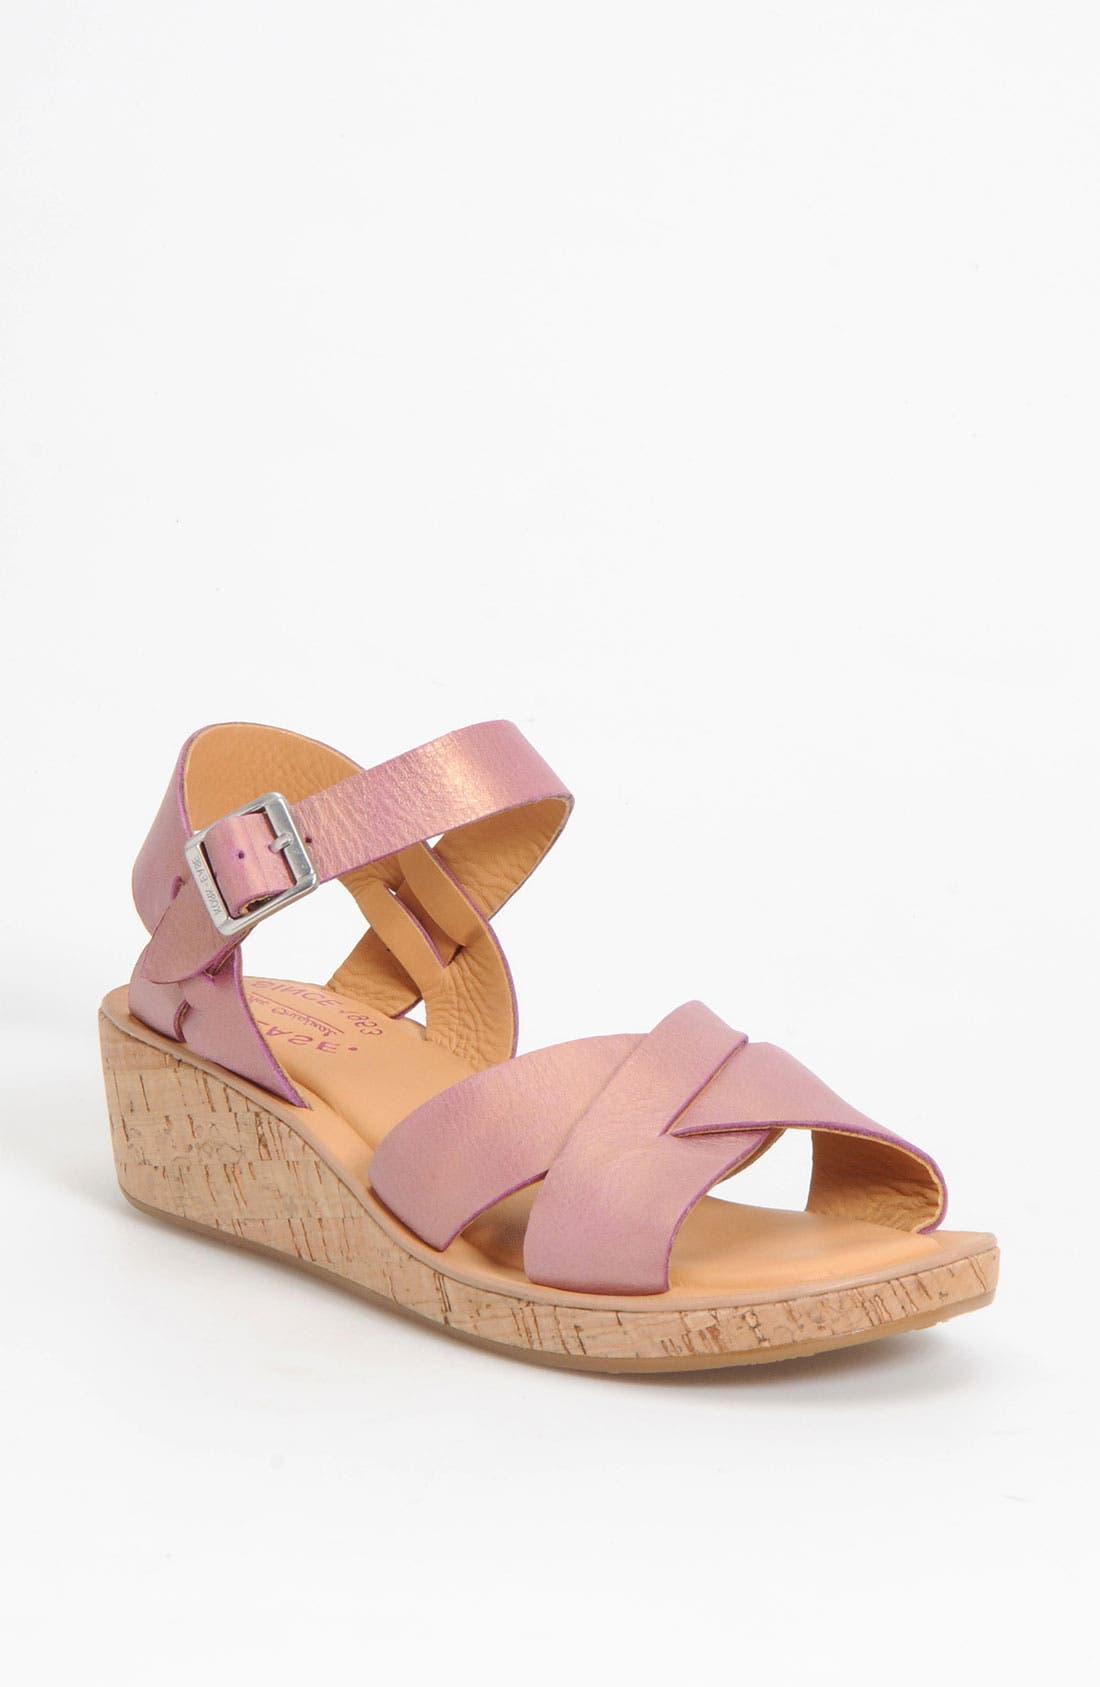 KORK-EASE<SUP>®</SUP> Kork-Ease 'Myrna' Sandal, Main, color, 500